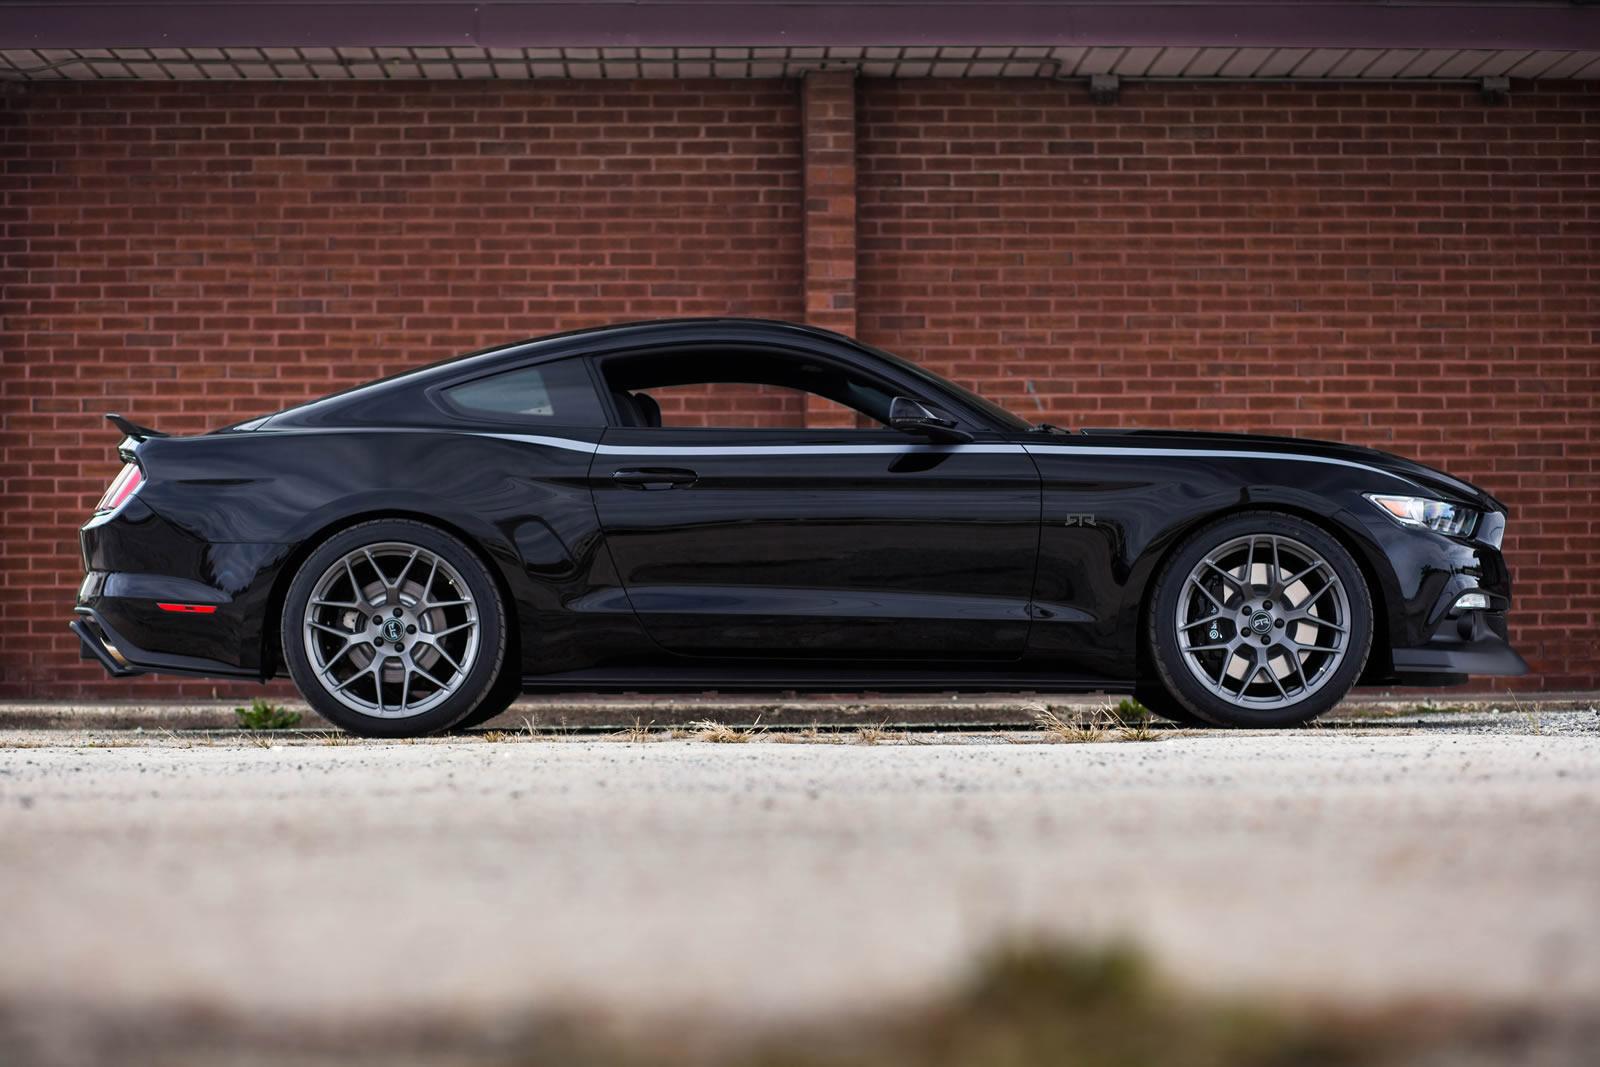 2015 Mustang RTR 2